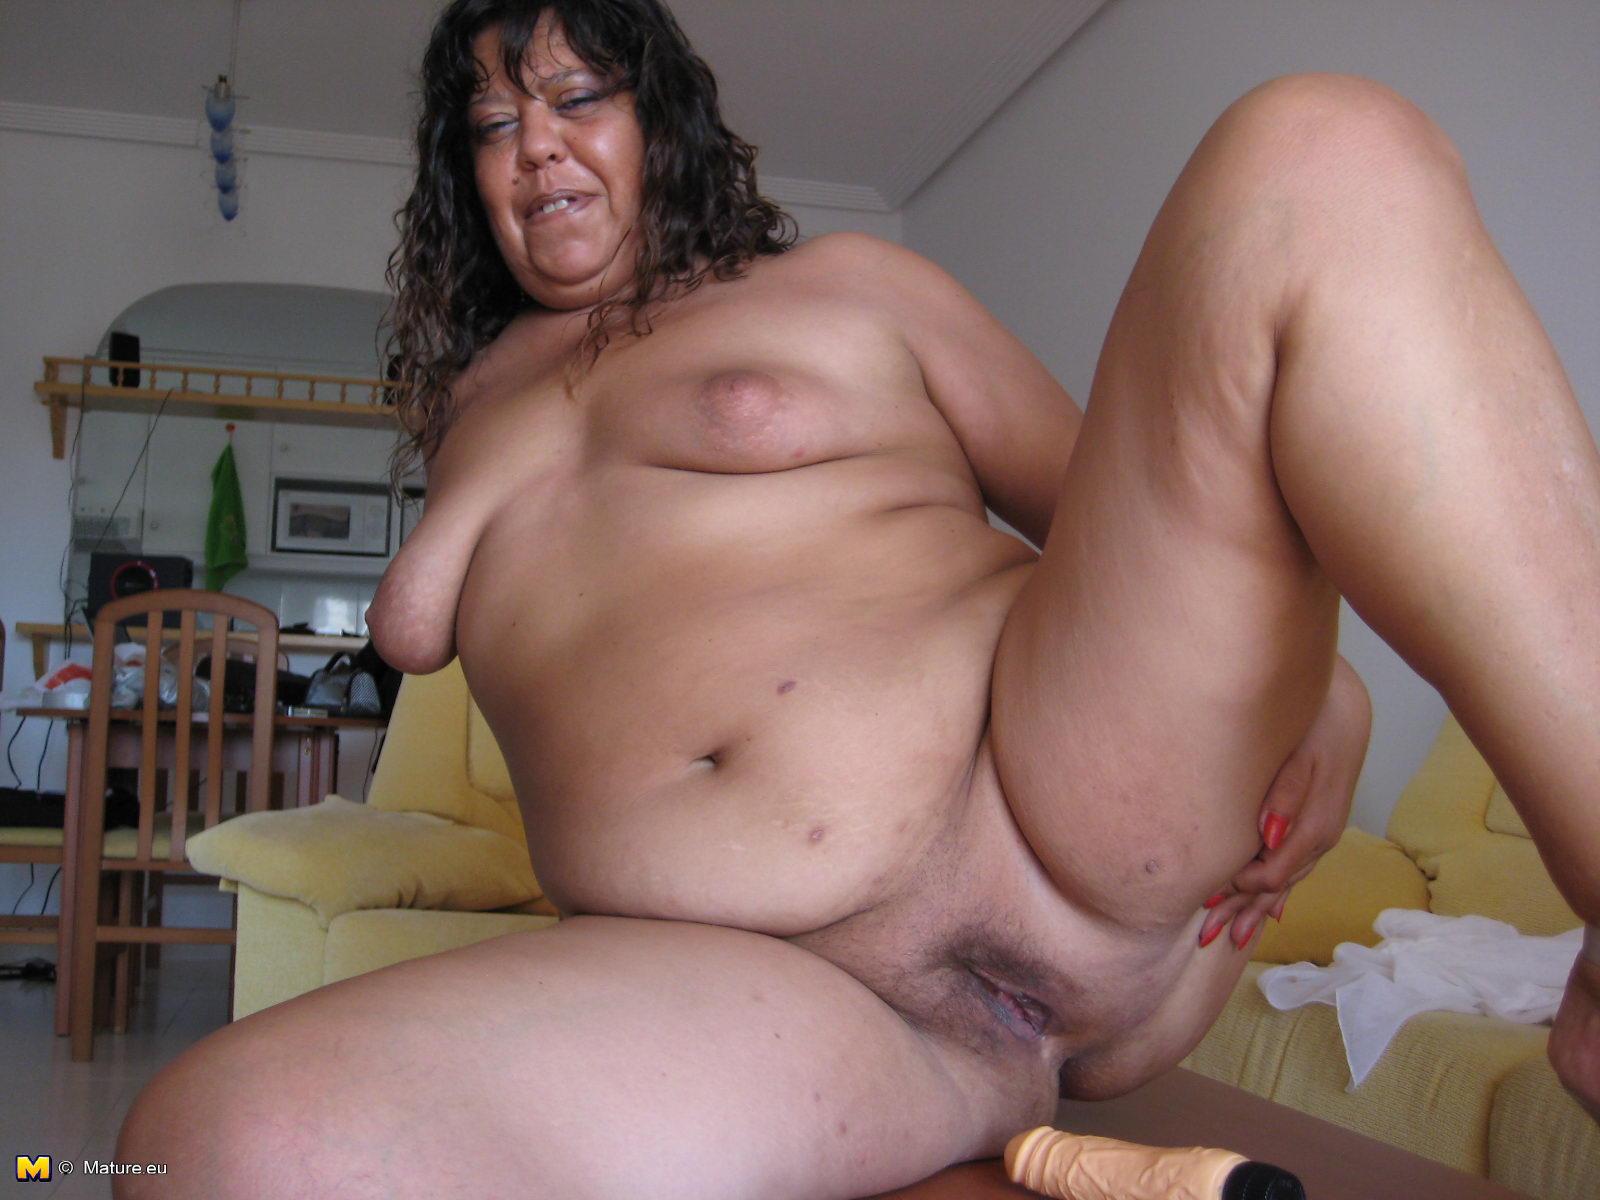 archiveoffoldwomen.blogspot.com: Latin Mature Pussy